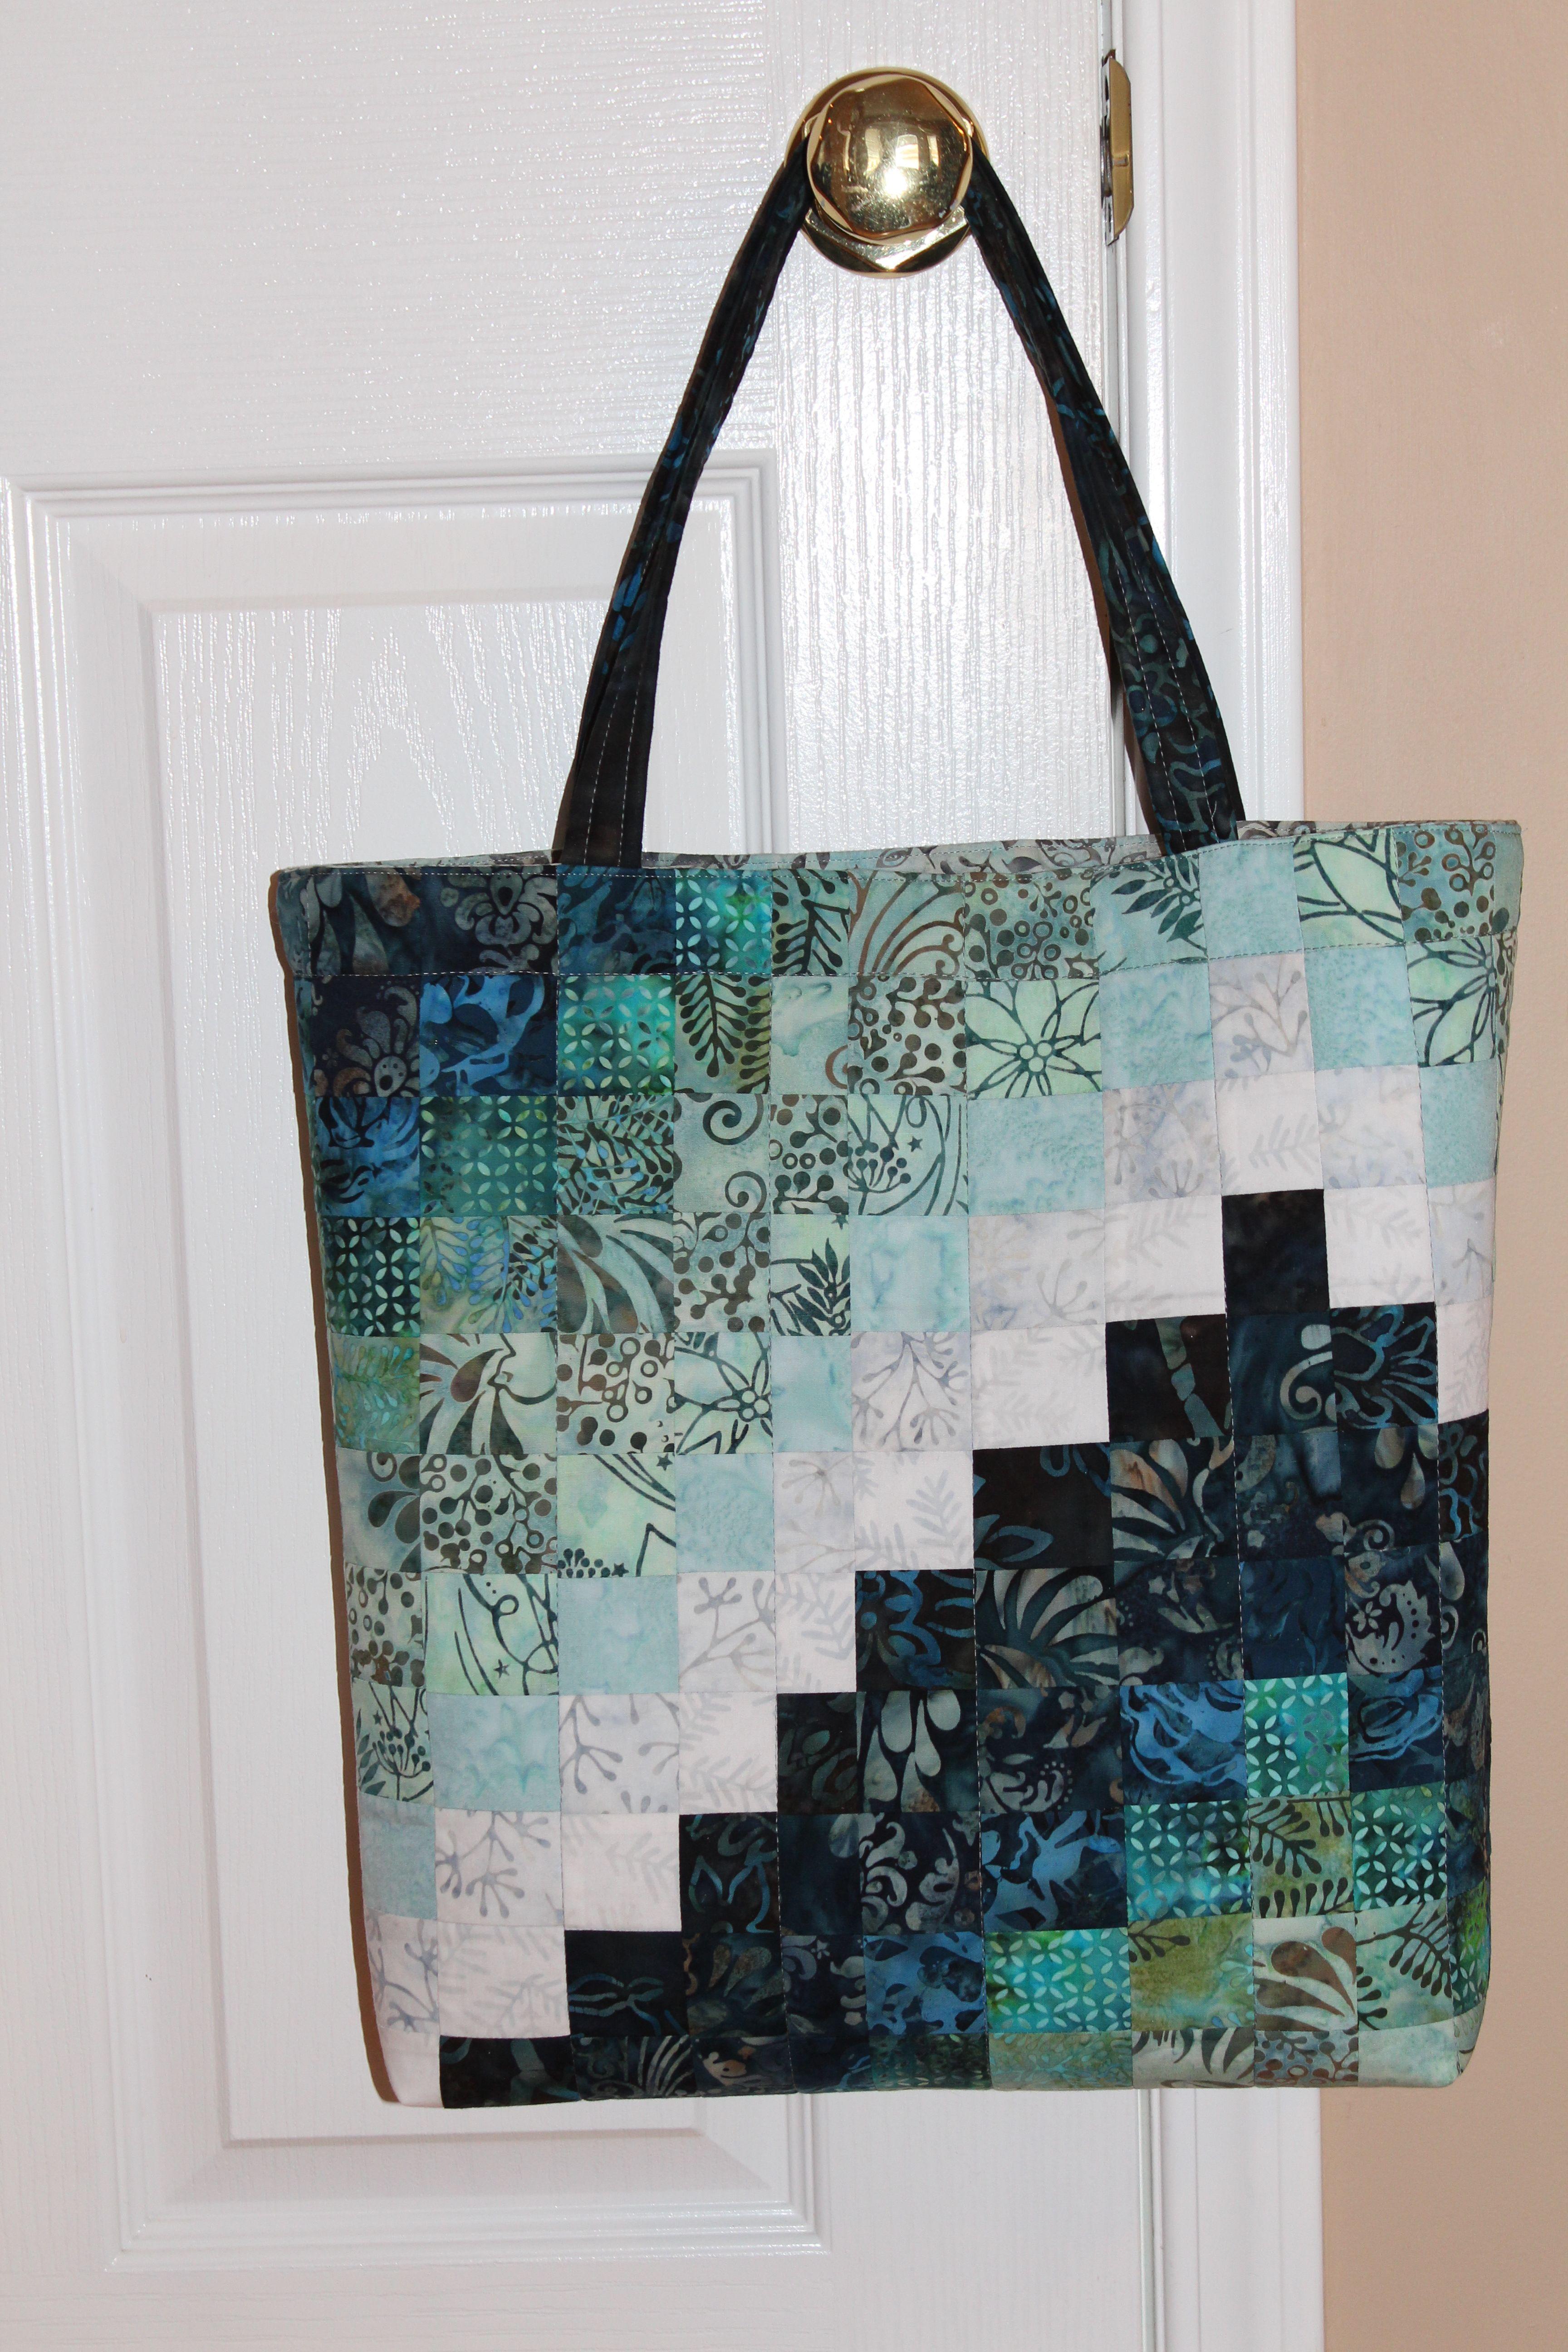 My Bargello Tote Bag - made with batiks & Aurifil thread on ...